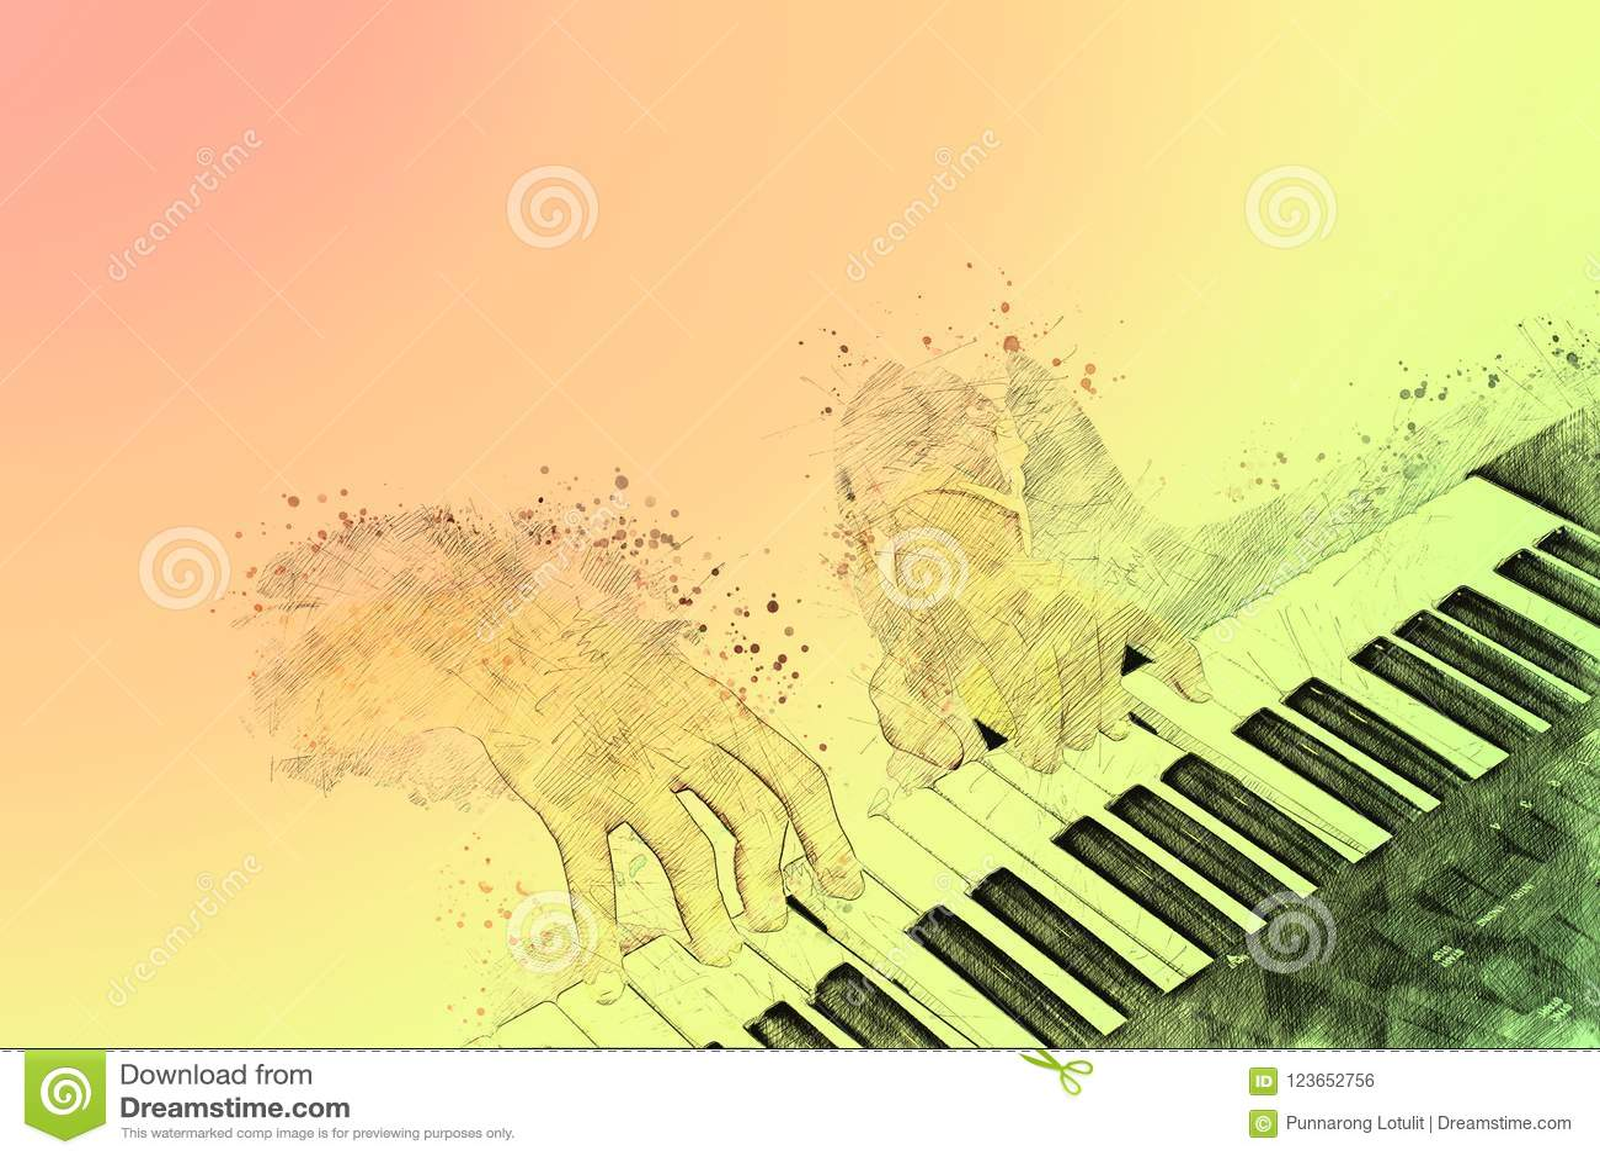 https fr dreamstime com piano fond peinture d aquarelle l illustration digital image123652756